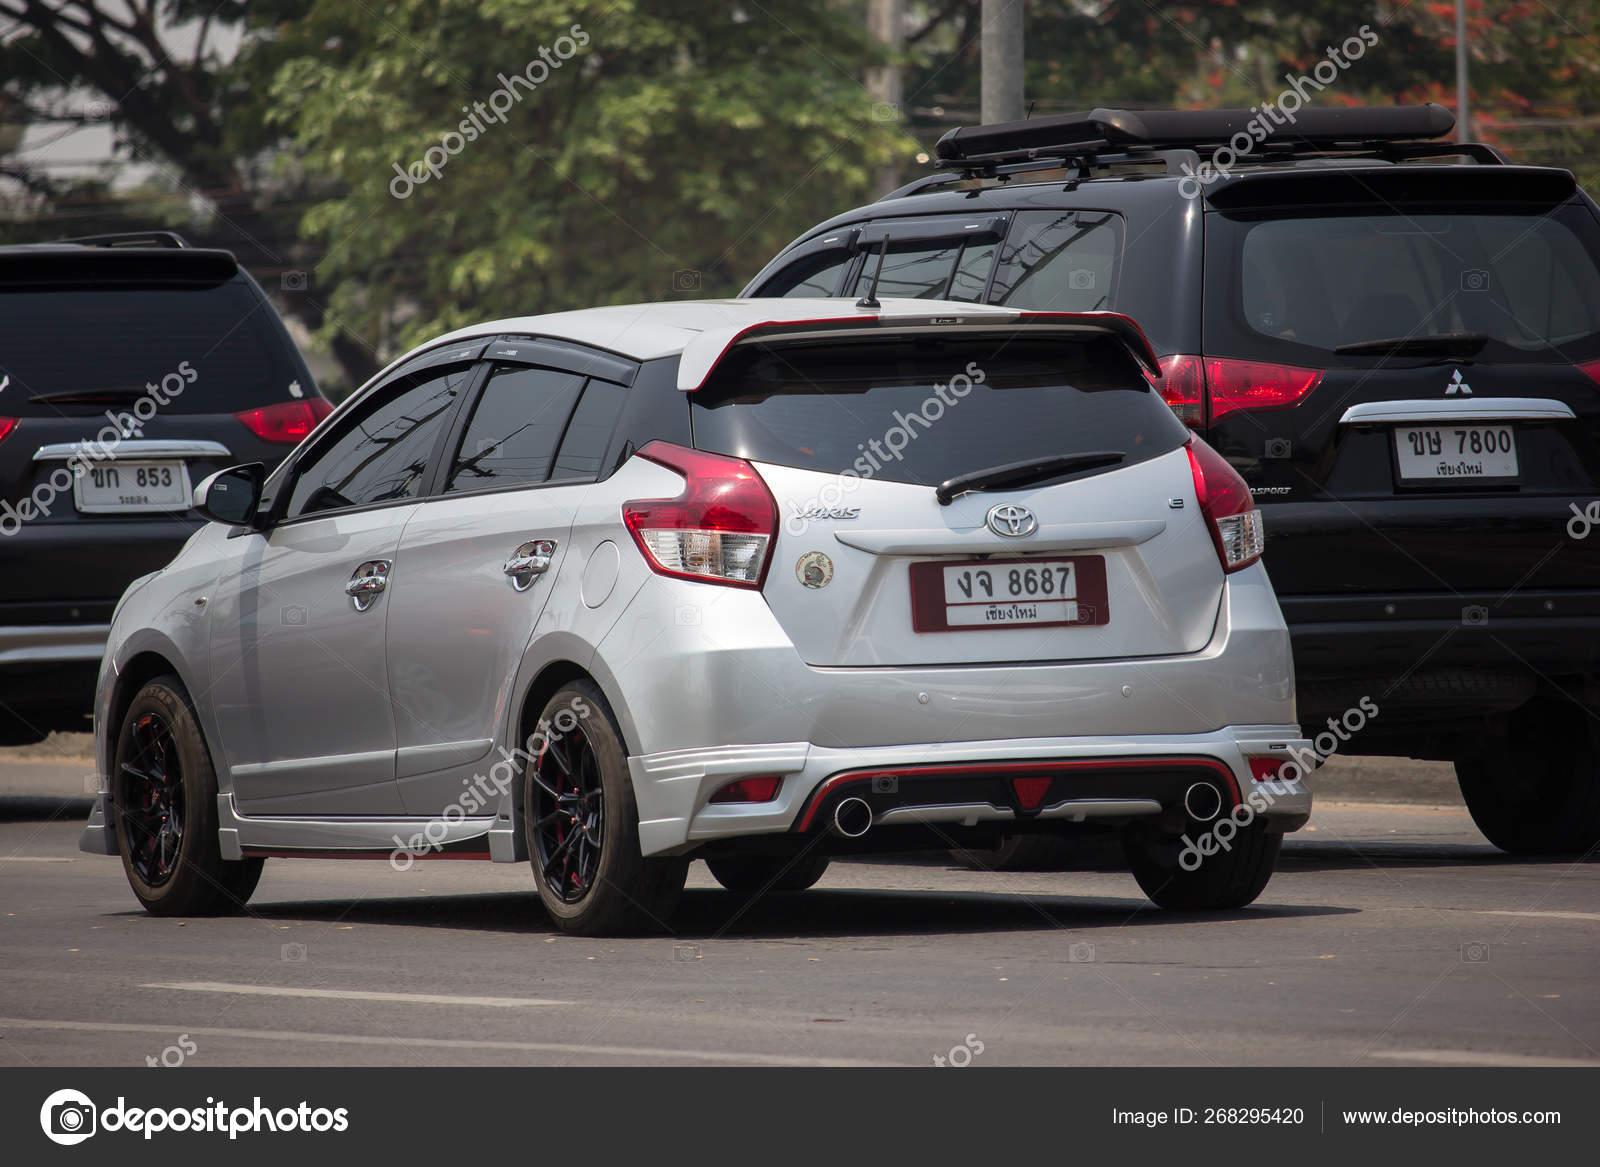 New Private Car Toyota Yaris Hatchback Eco Car Stock Editorial Photo C Nitinut380 268295420